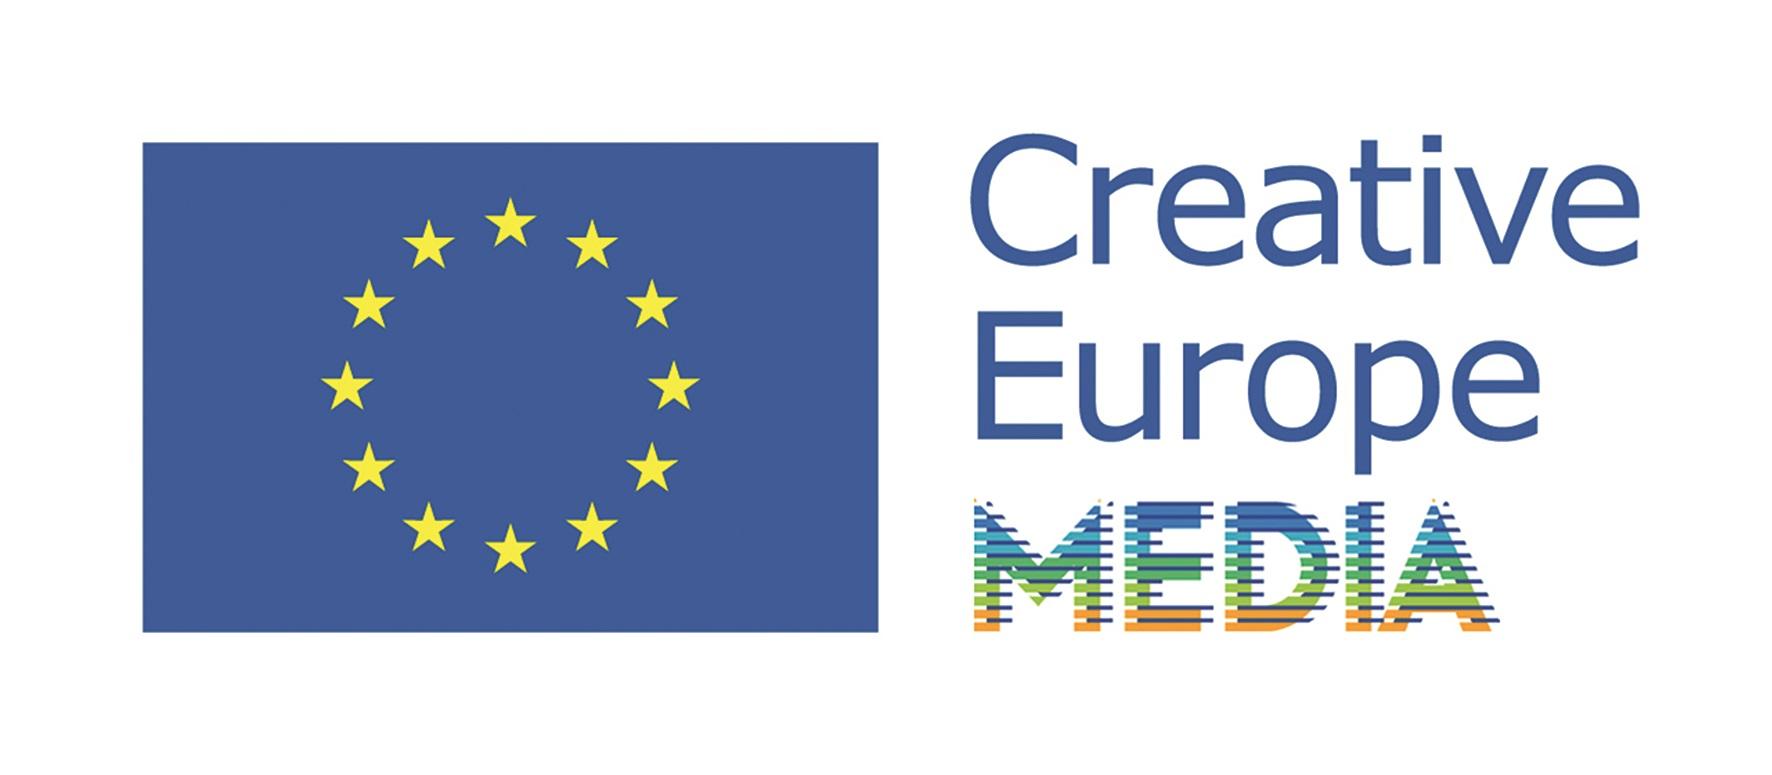 MEDIA/Creative Europe Desk